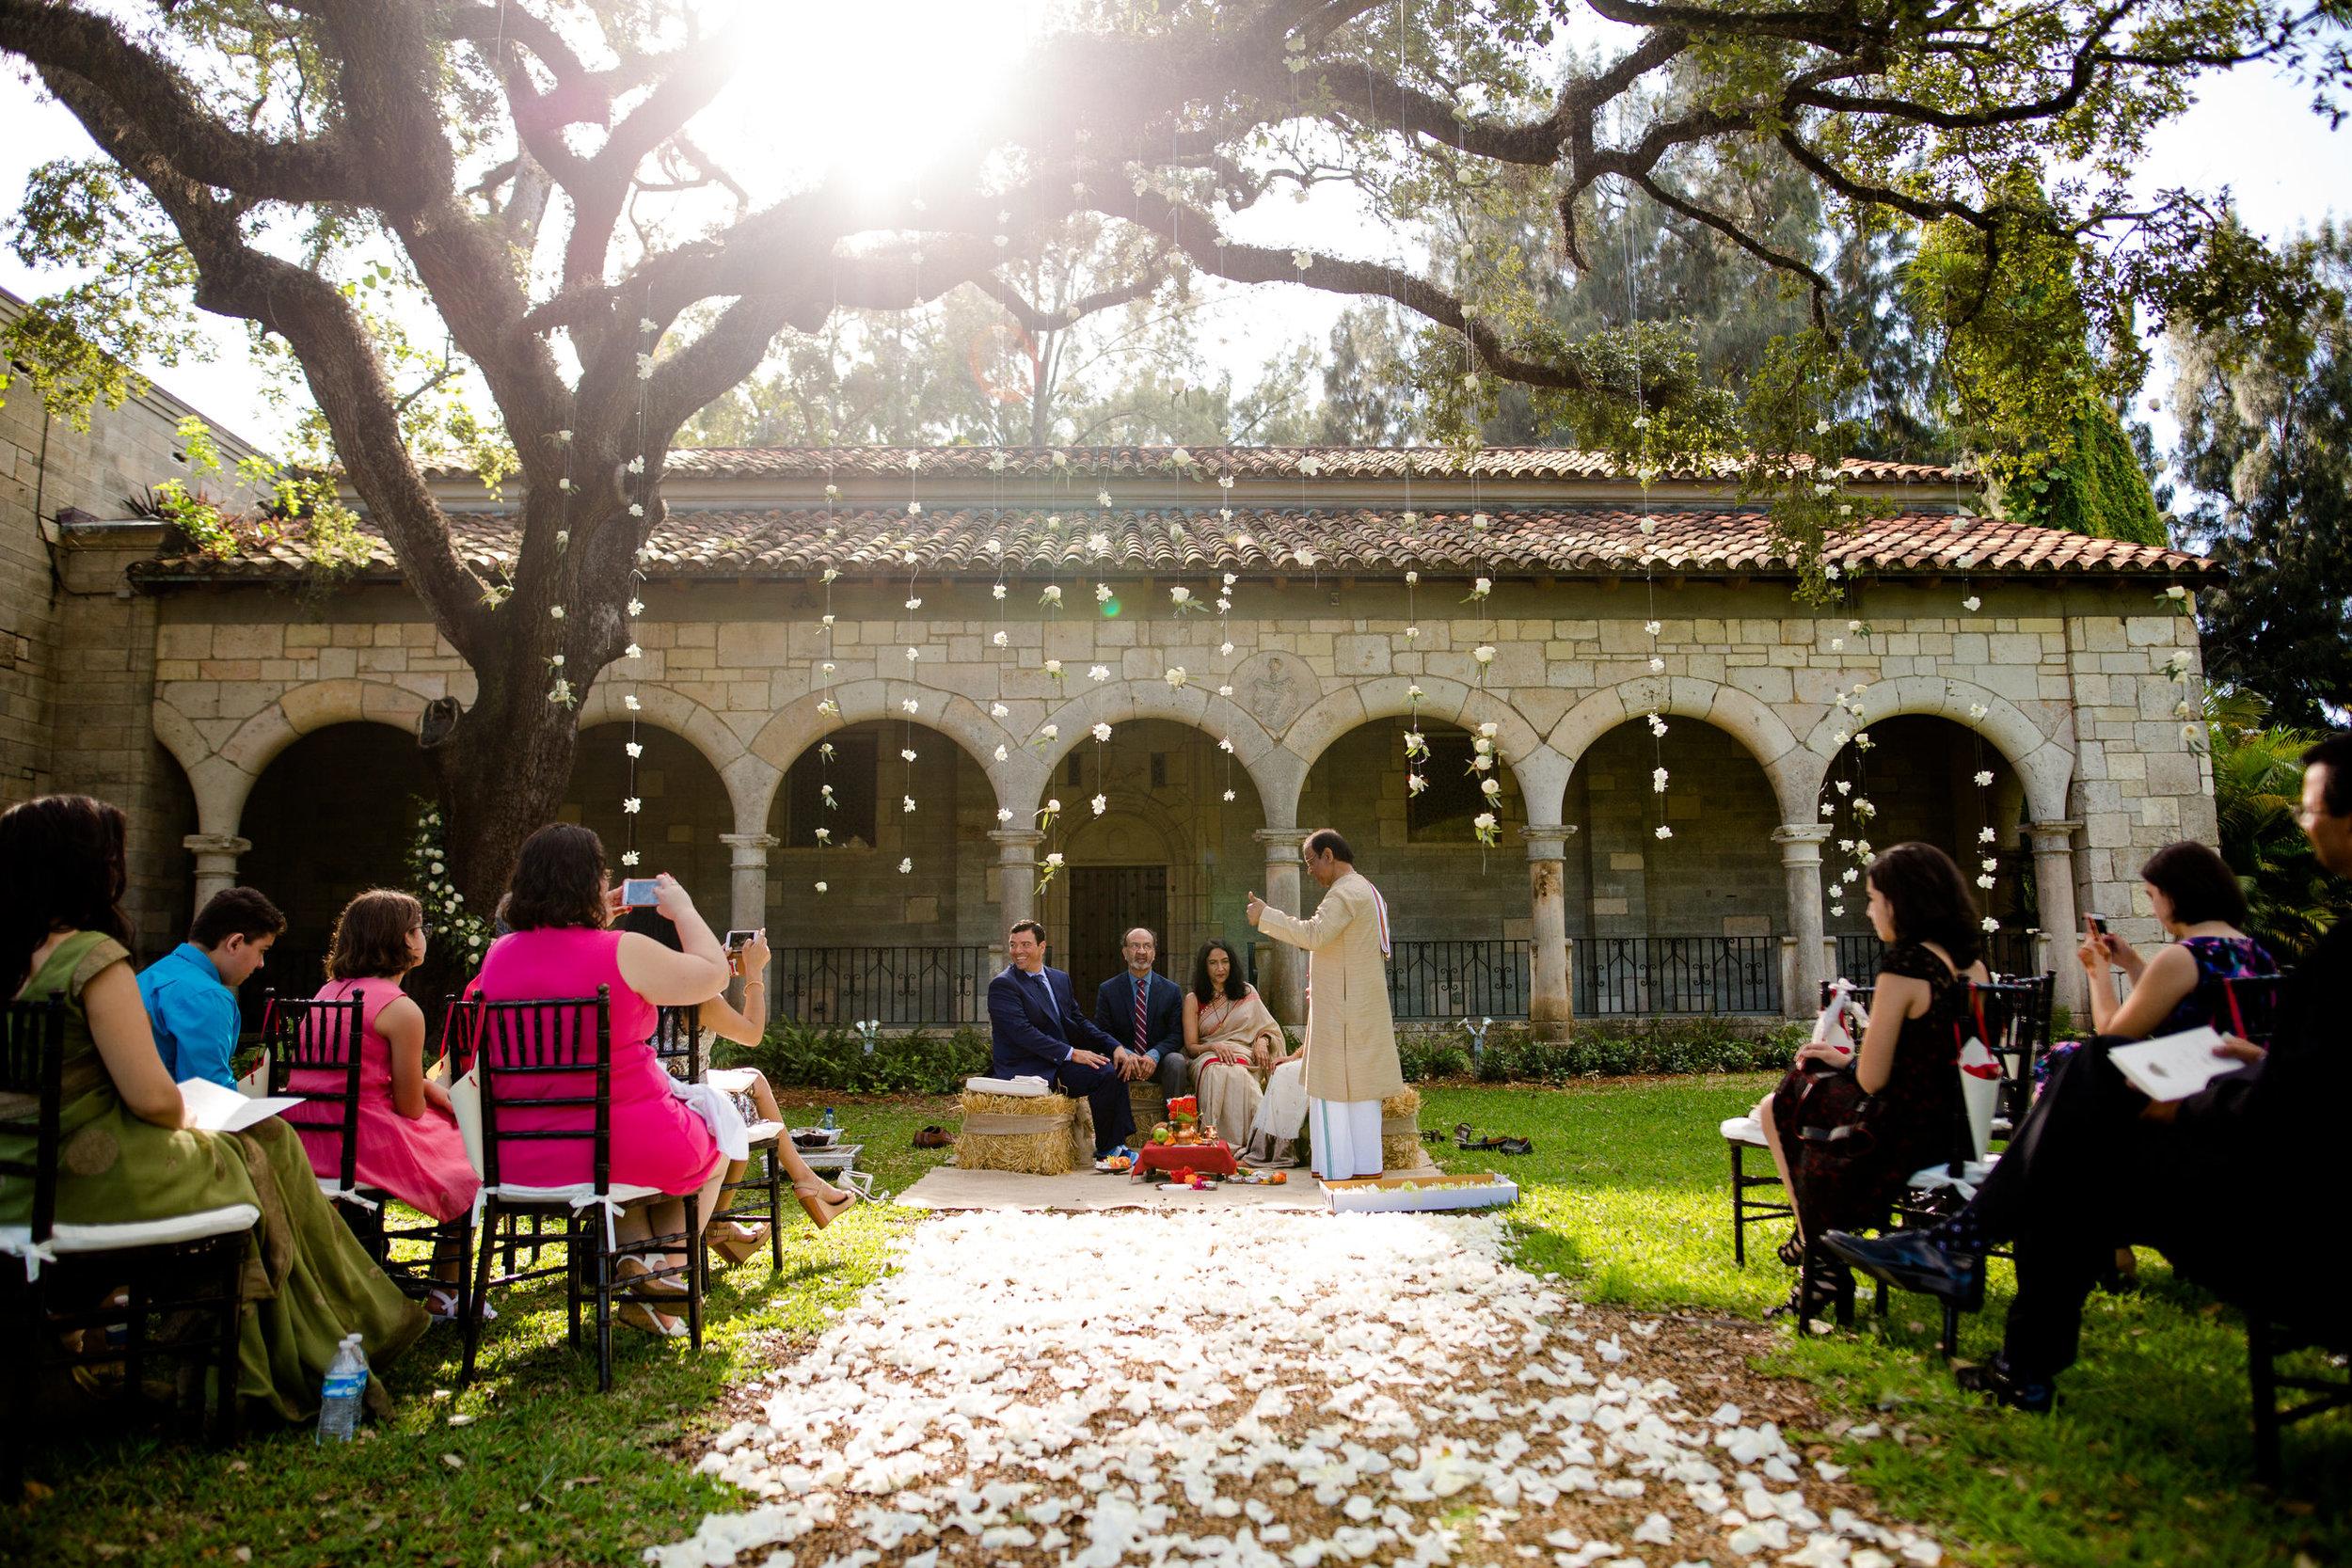 best-wedding-venue-miami-spanish-monastery-tiny-house-photo-international.jpg